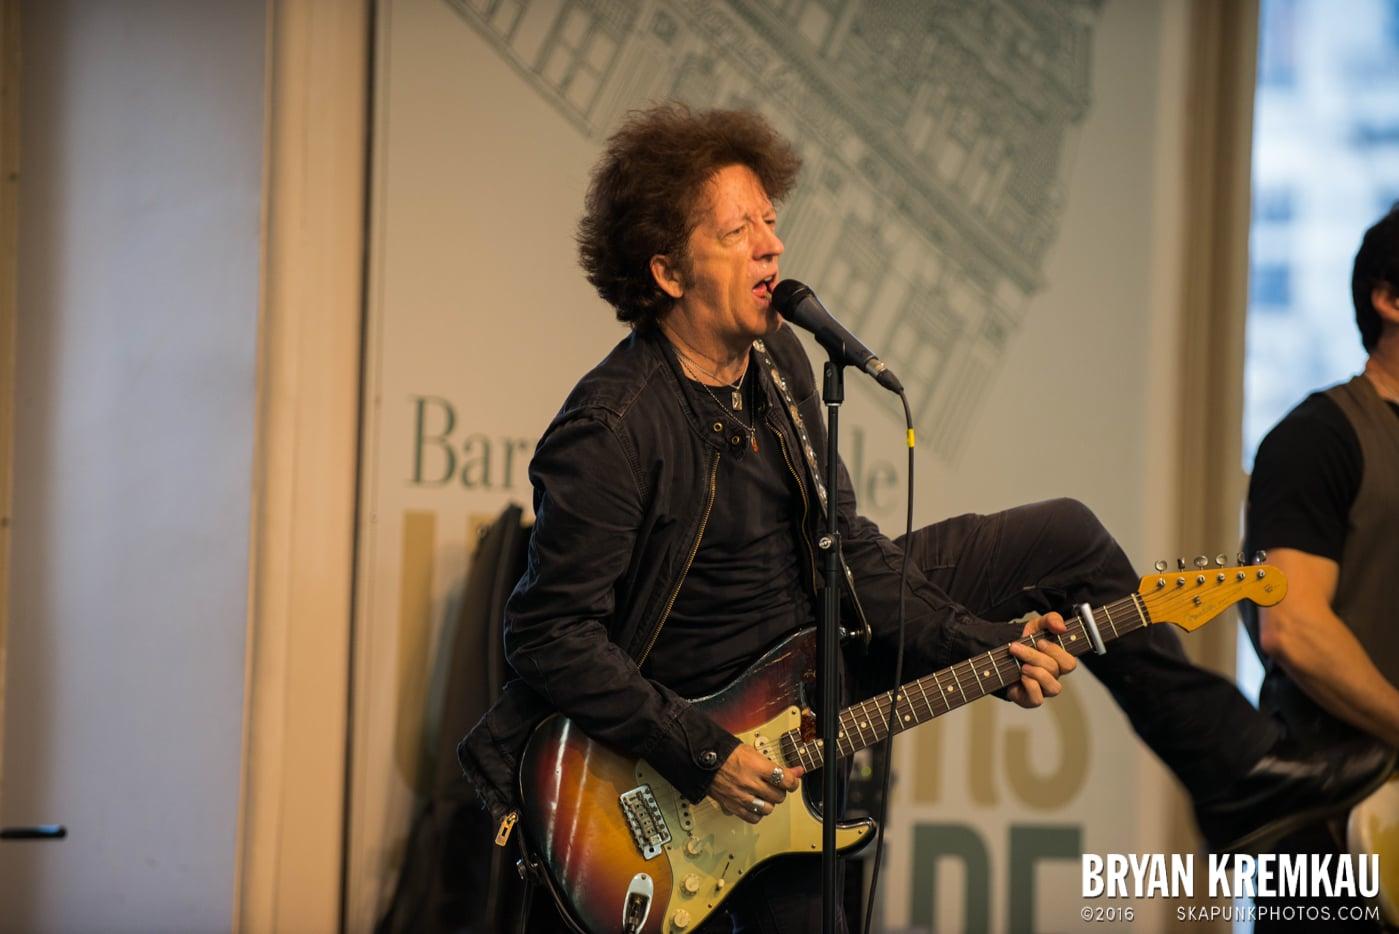 Willie Nile @ Barnes & Noble: Union Square, NYC - 6.25.13 (13)